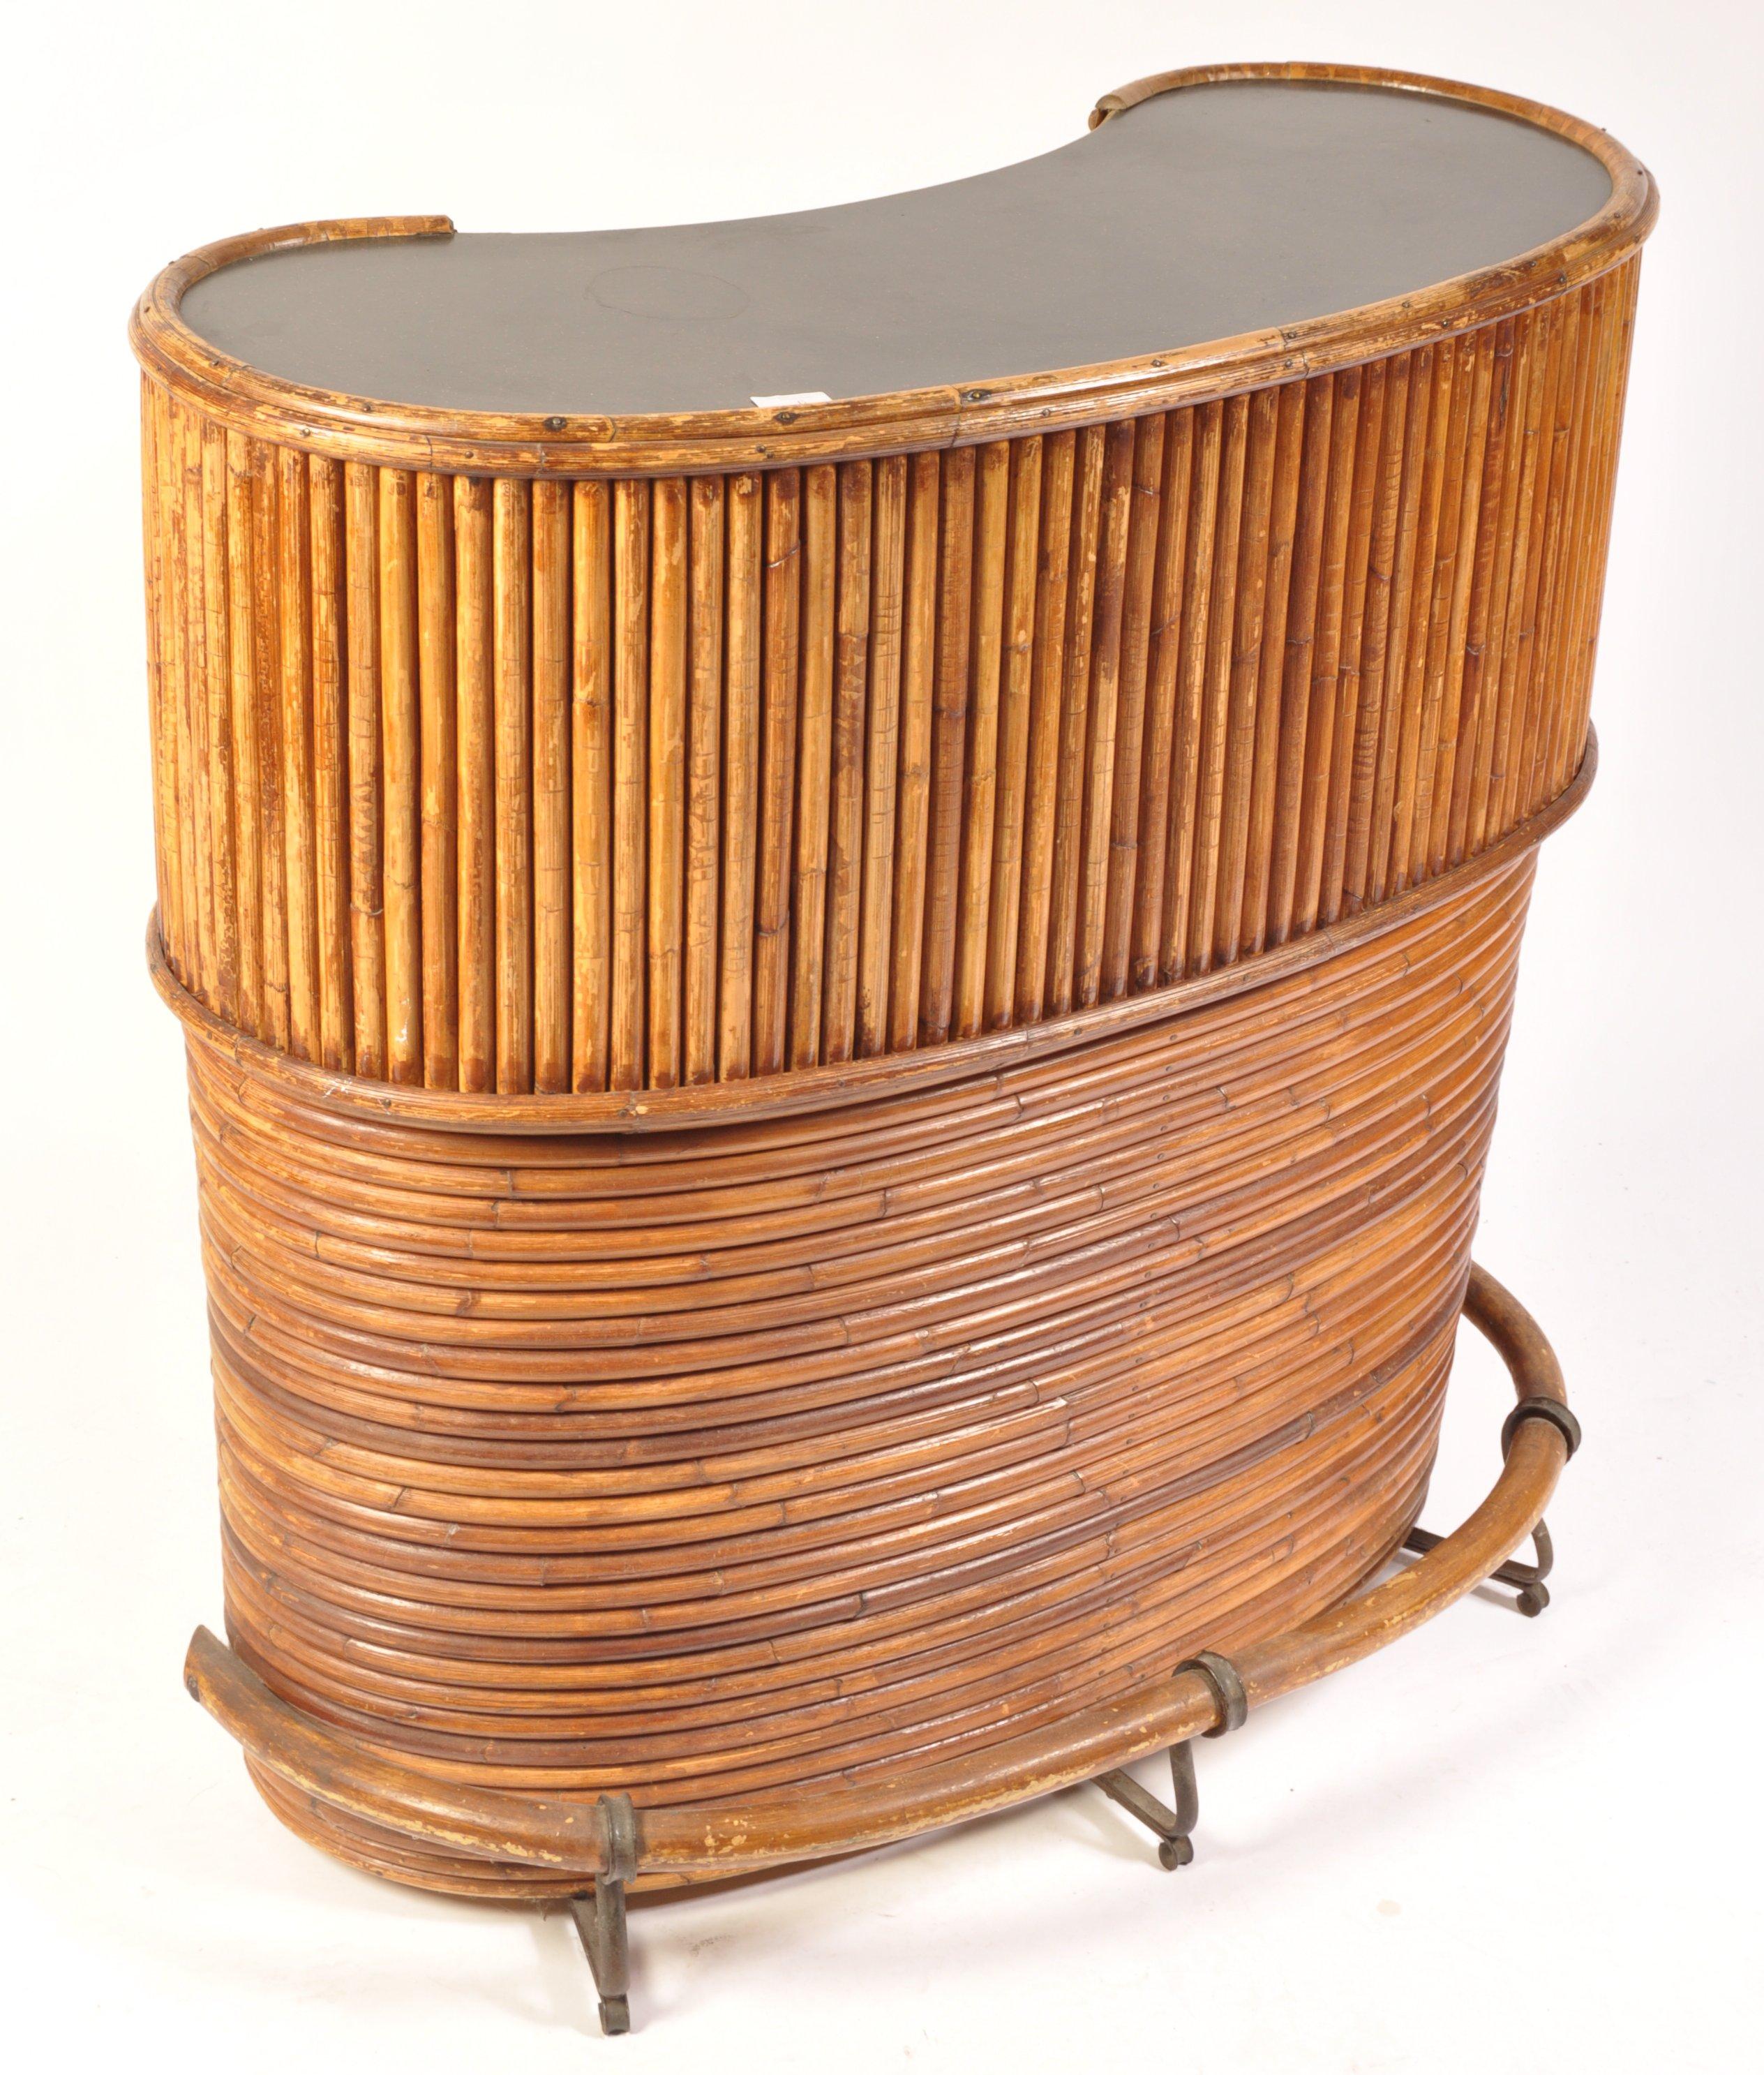 Lot 6 - 1950'S RETRO VINTAGE KIDNEY SHAPED BENT CANE COCKTAIL BAR